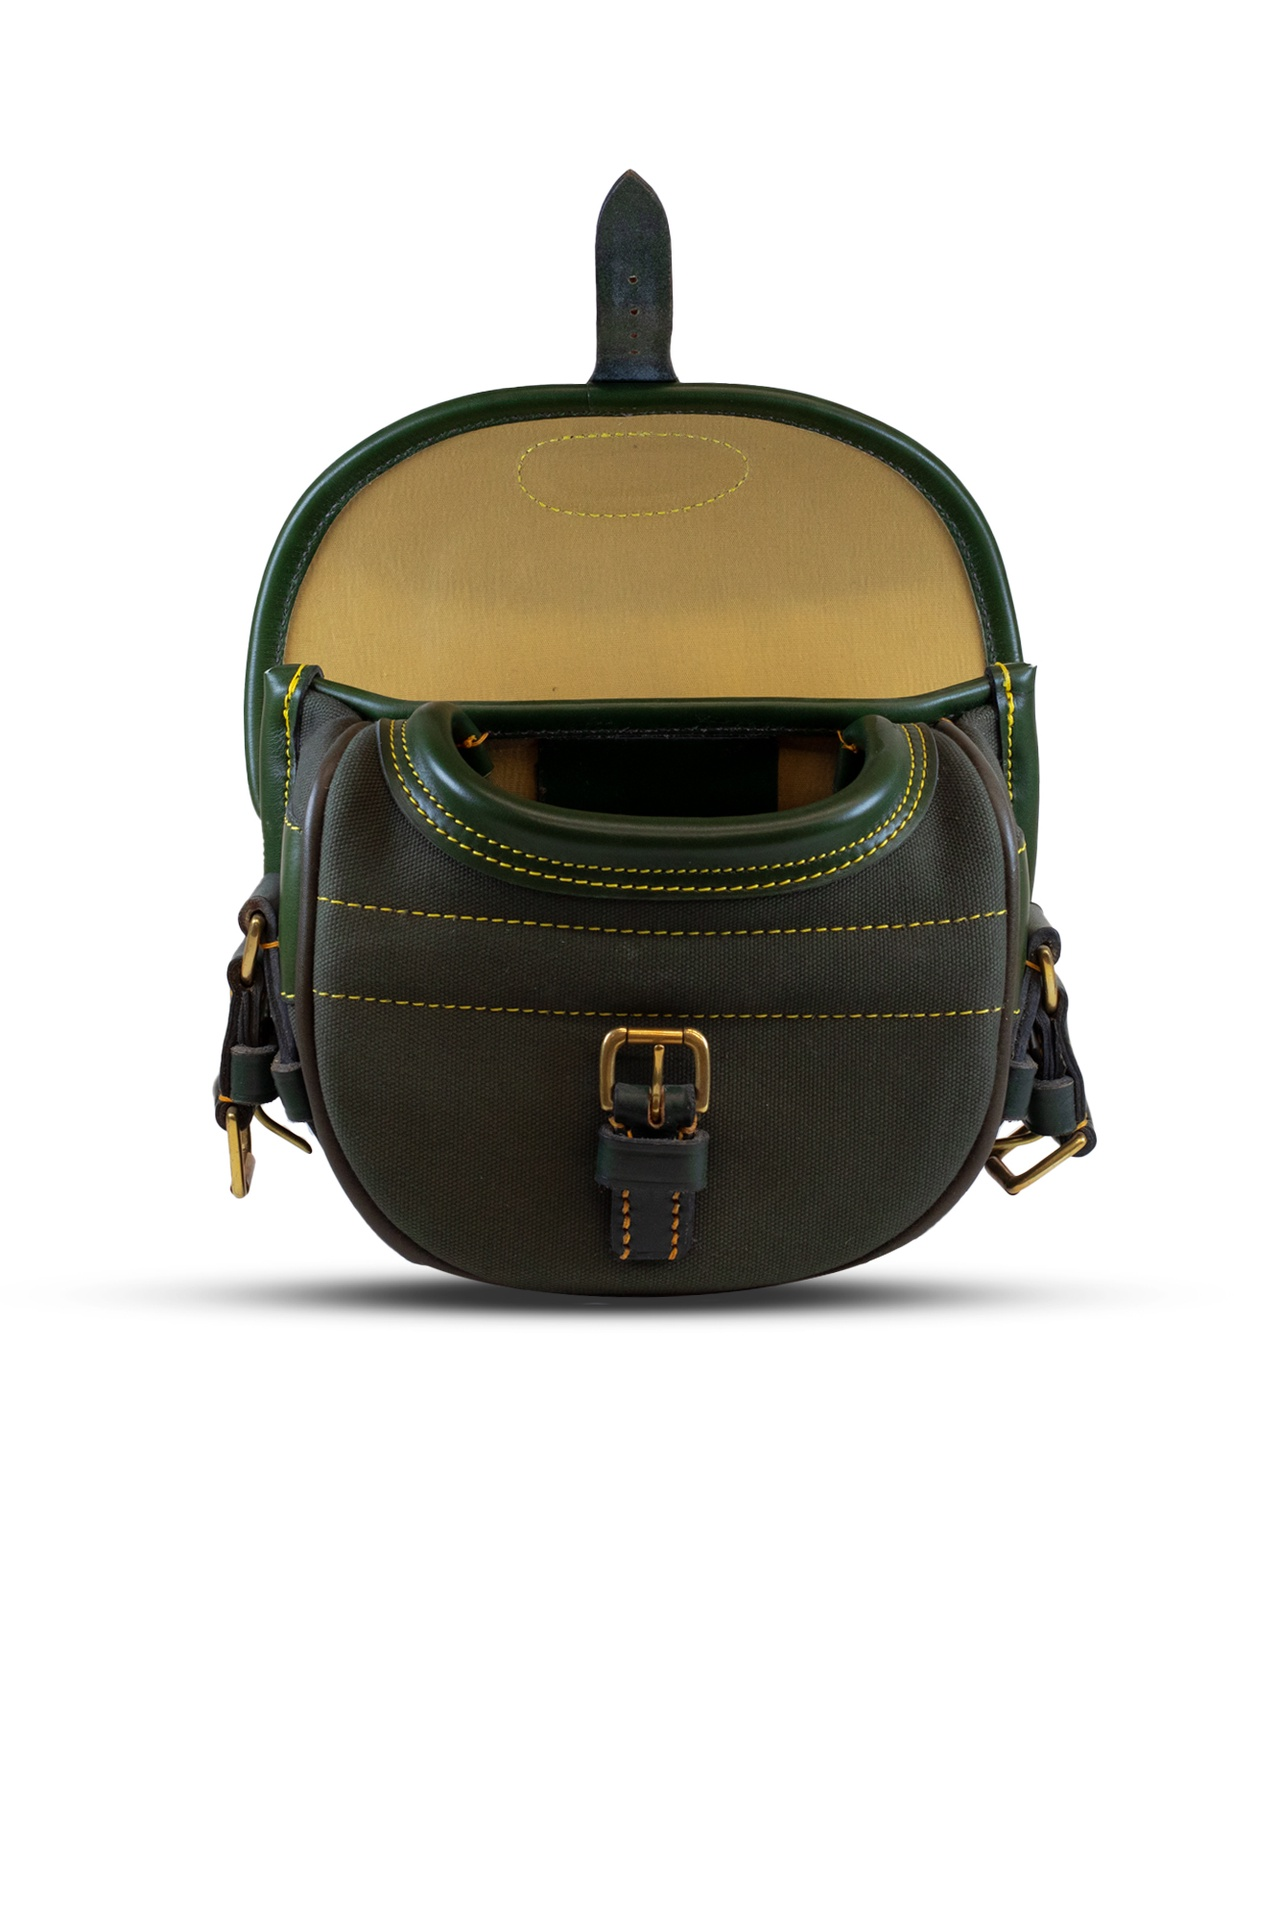 Canvas & Leather Cartridge Bag (75) – Green/Green Trim